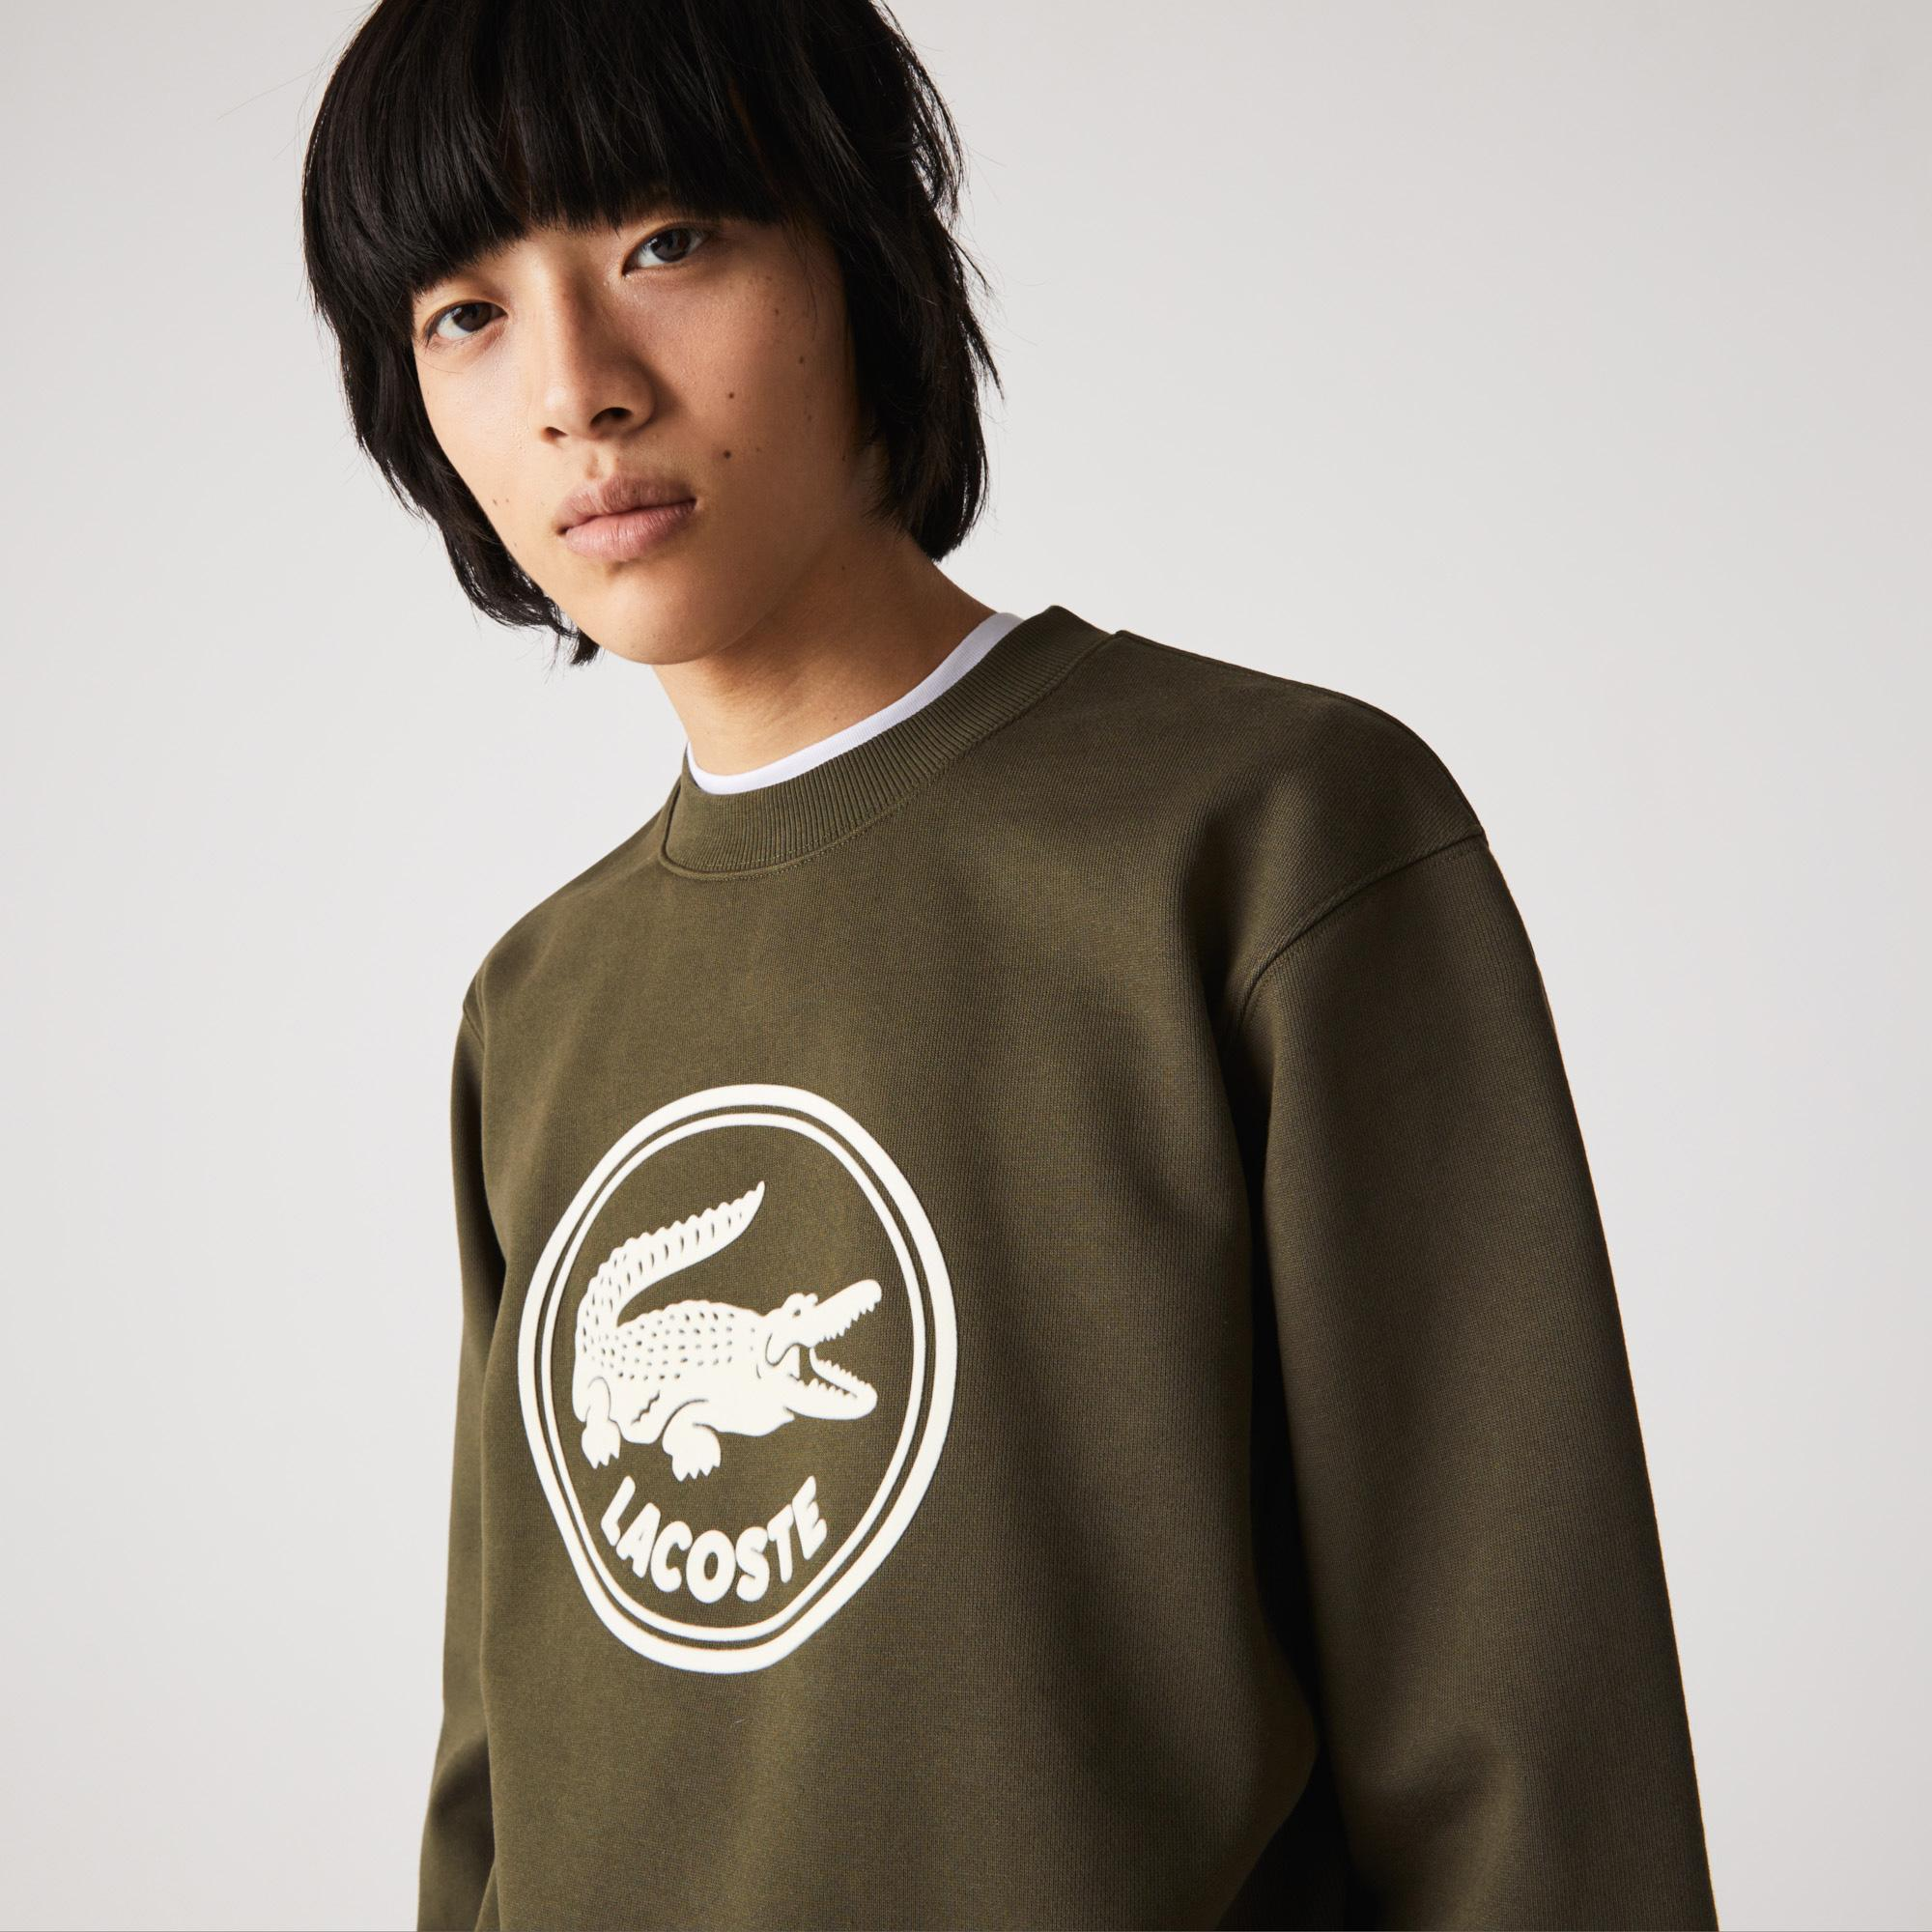 Lacoste Unisex 3D Logo Organic Cotton Fleece Sweatshirt